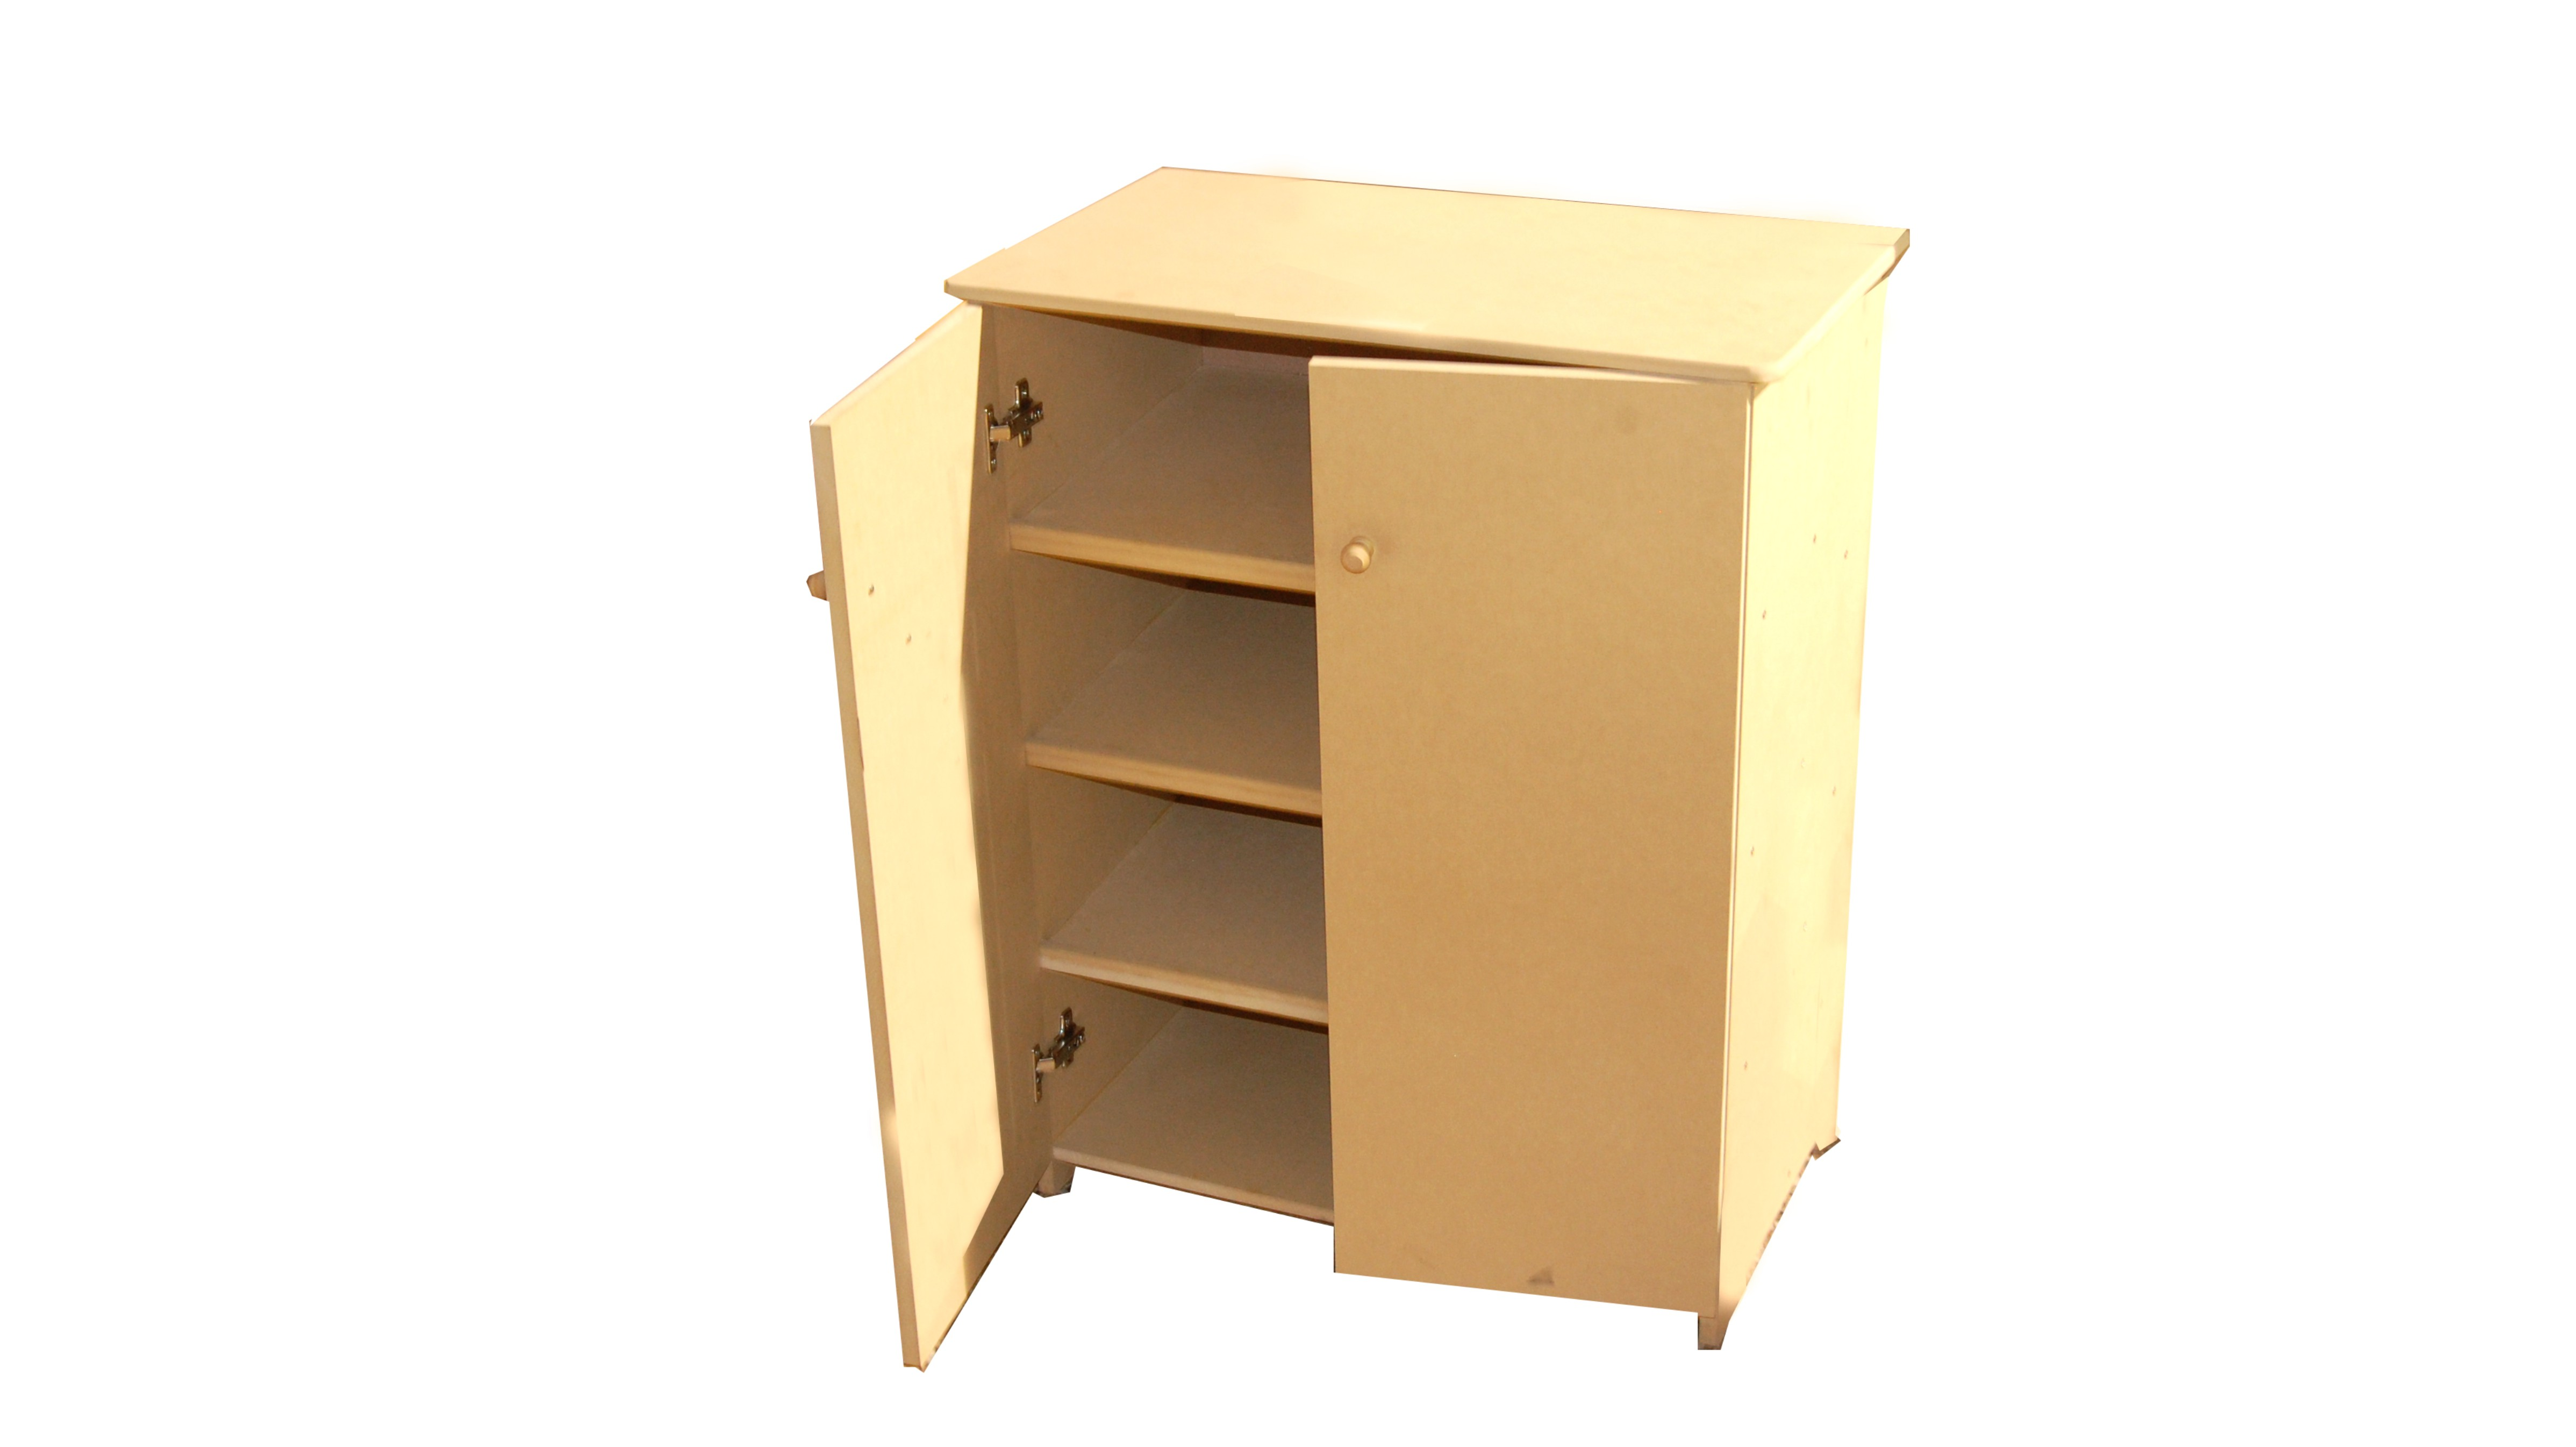 Catalogo de productos de placacentro maderas america en salta for Catalogo de muebles de madera para el hogar pdf